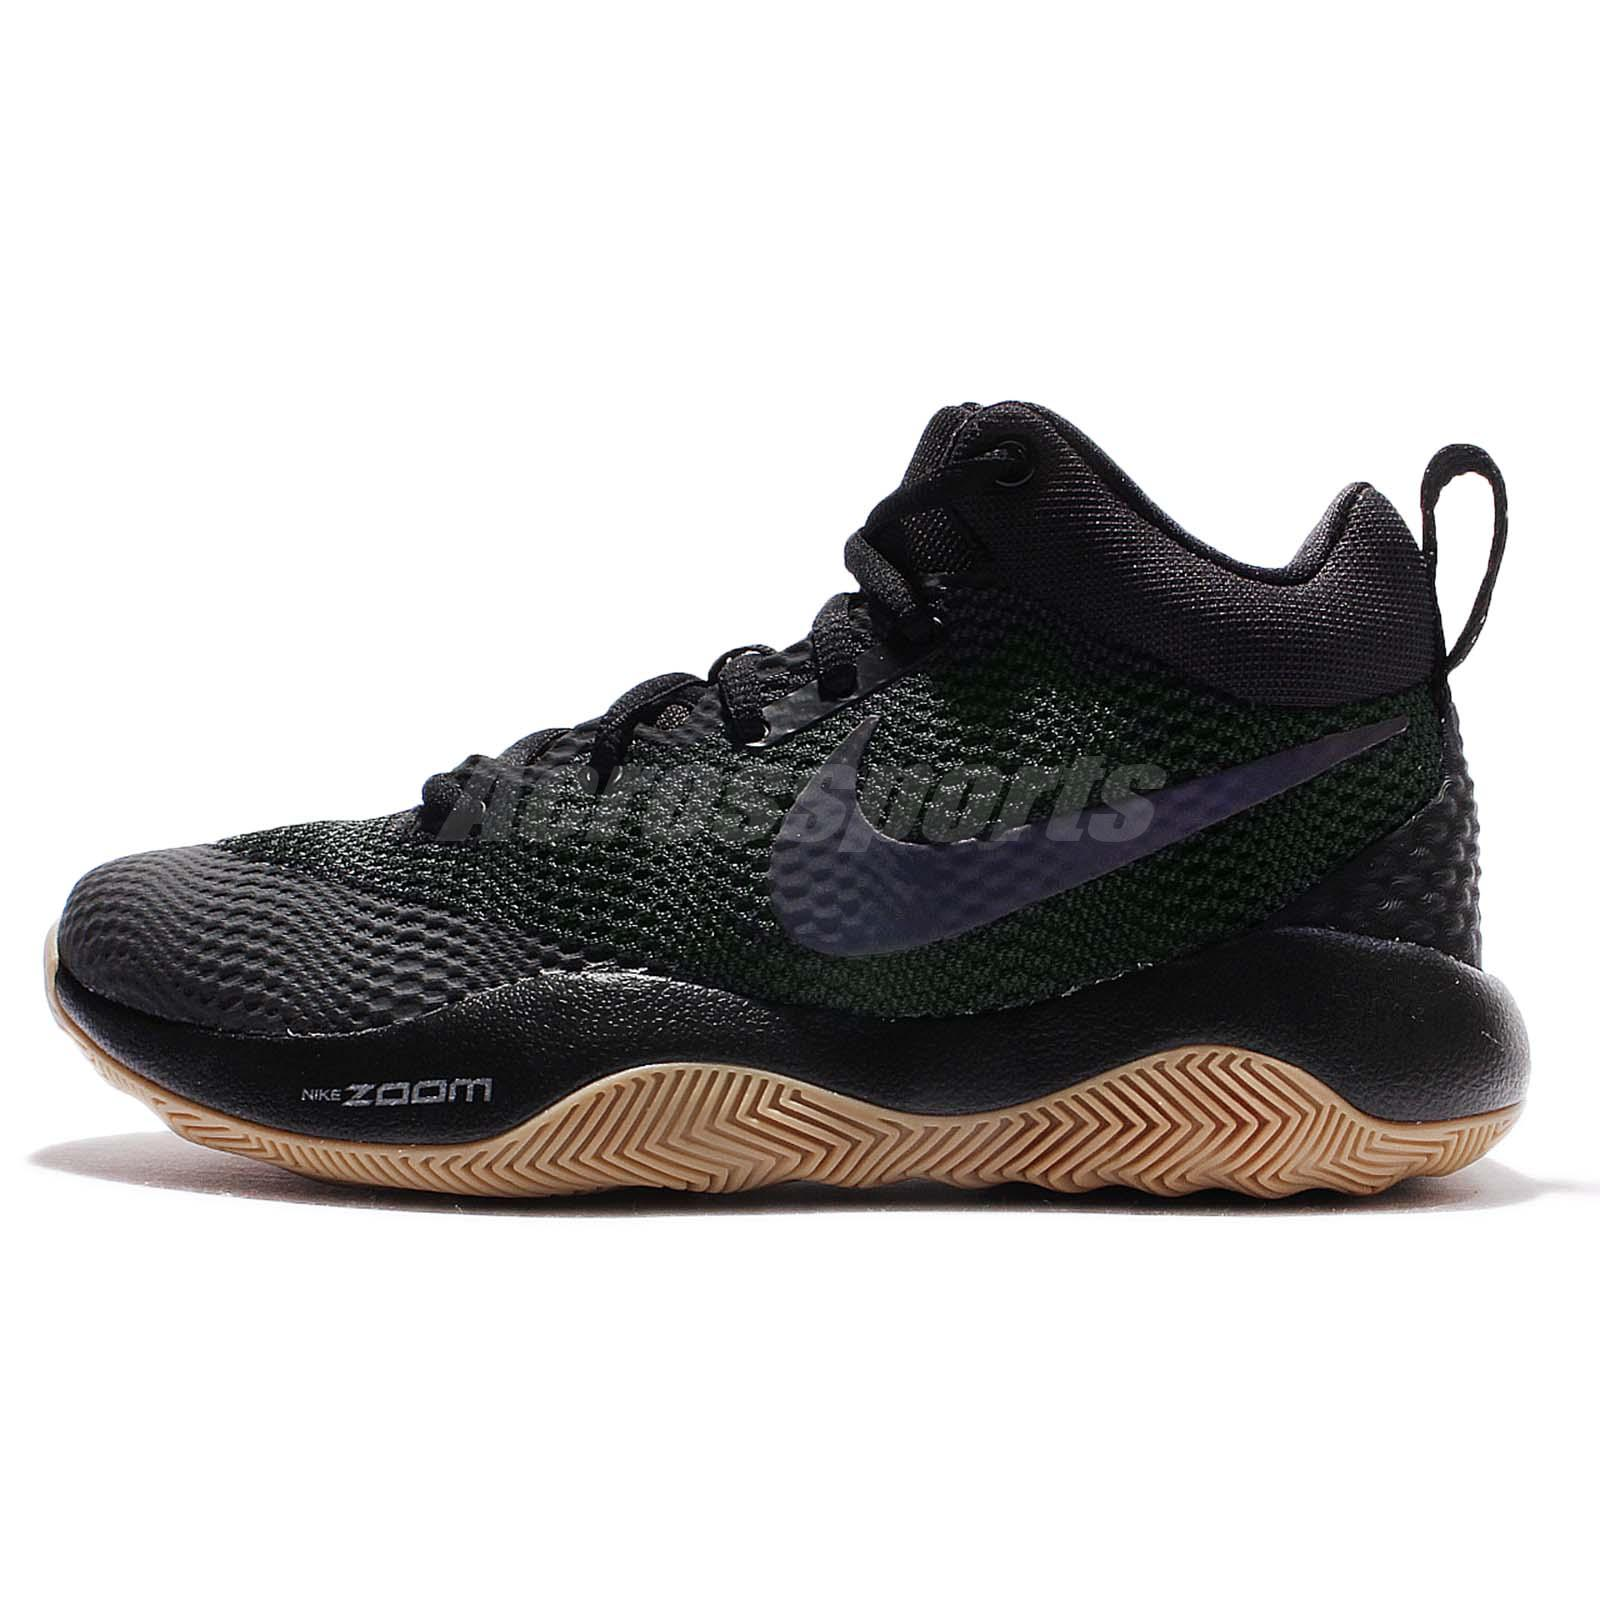 Nike Zoom Vick 3 Black Basketball Shoes For Girls  1923996f6